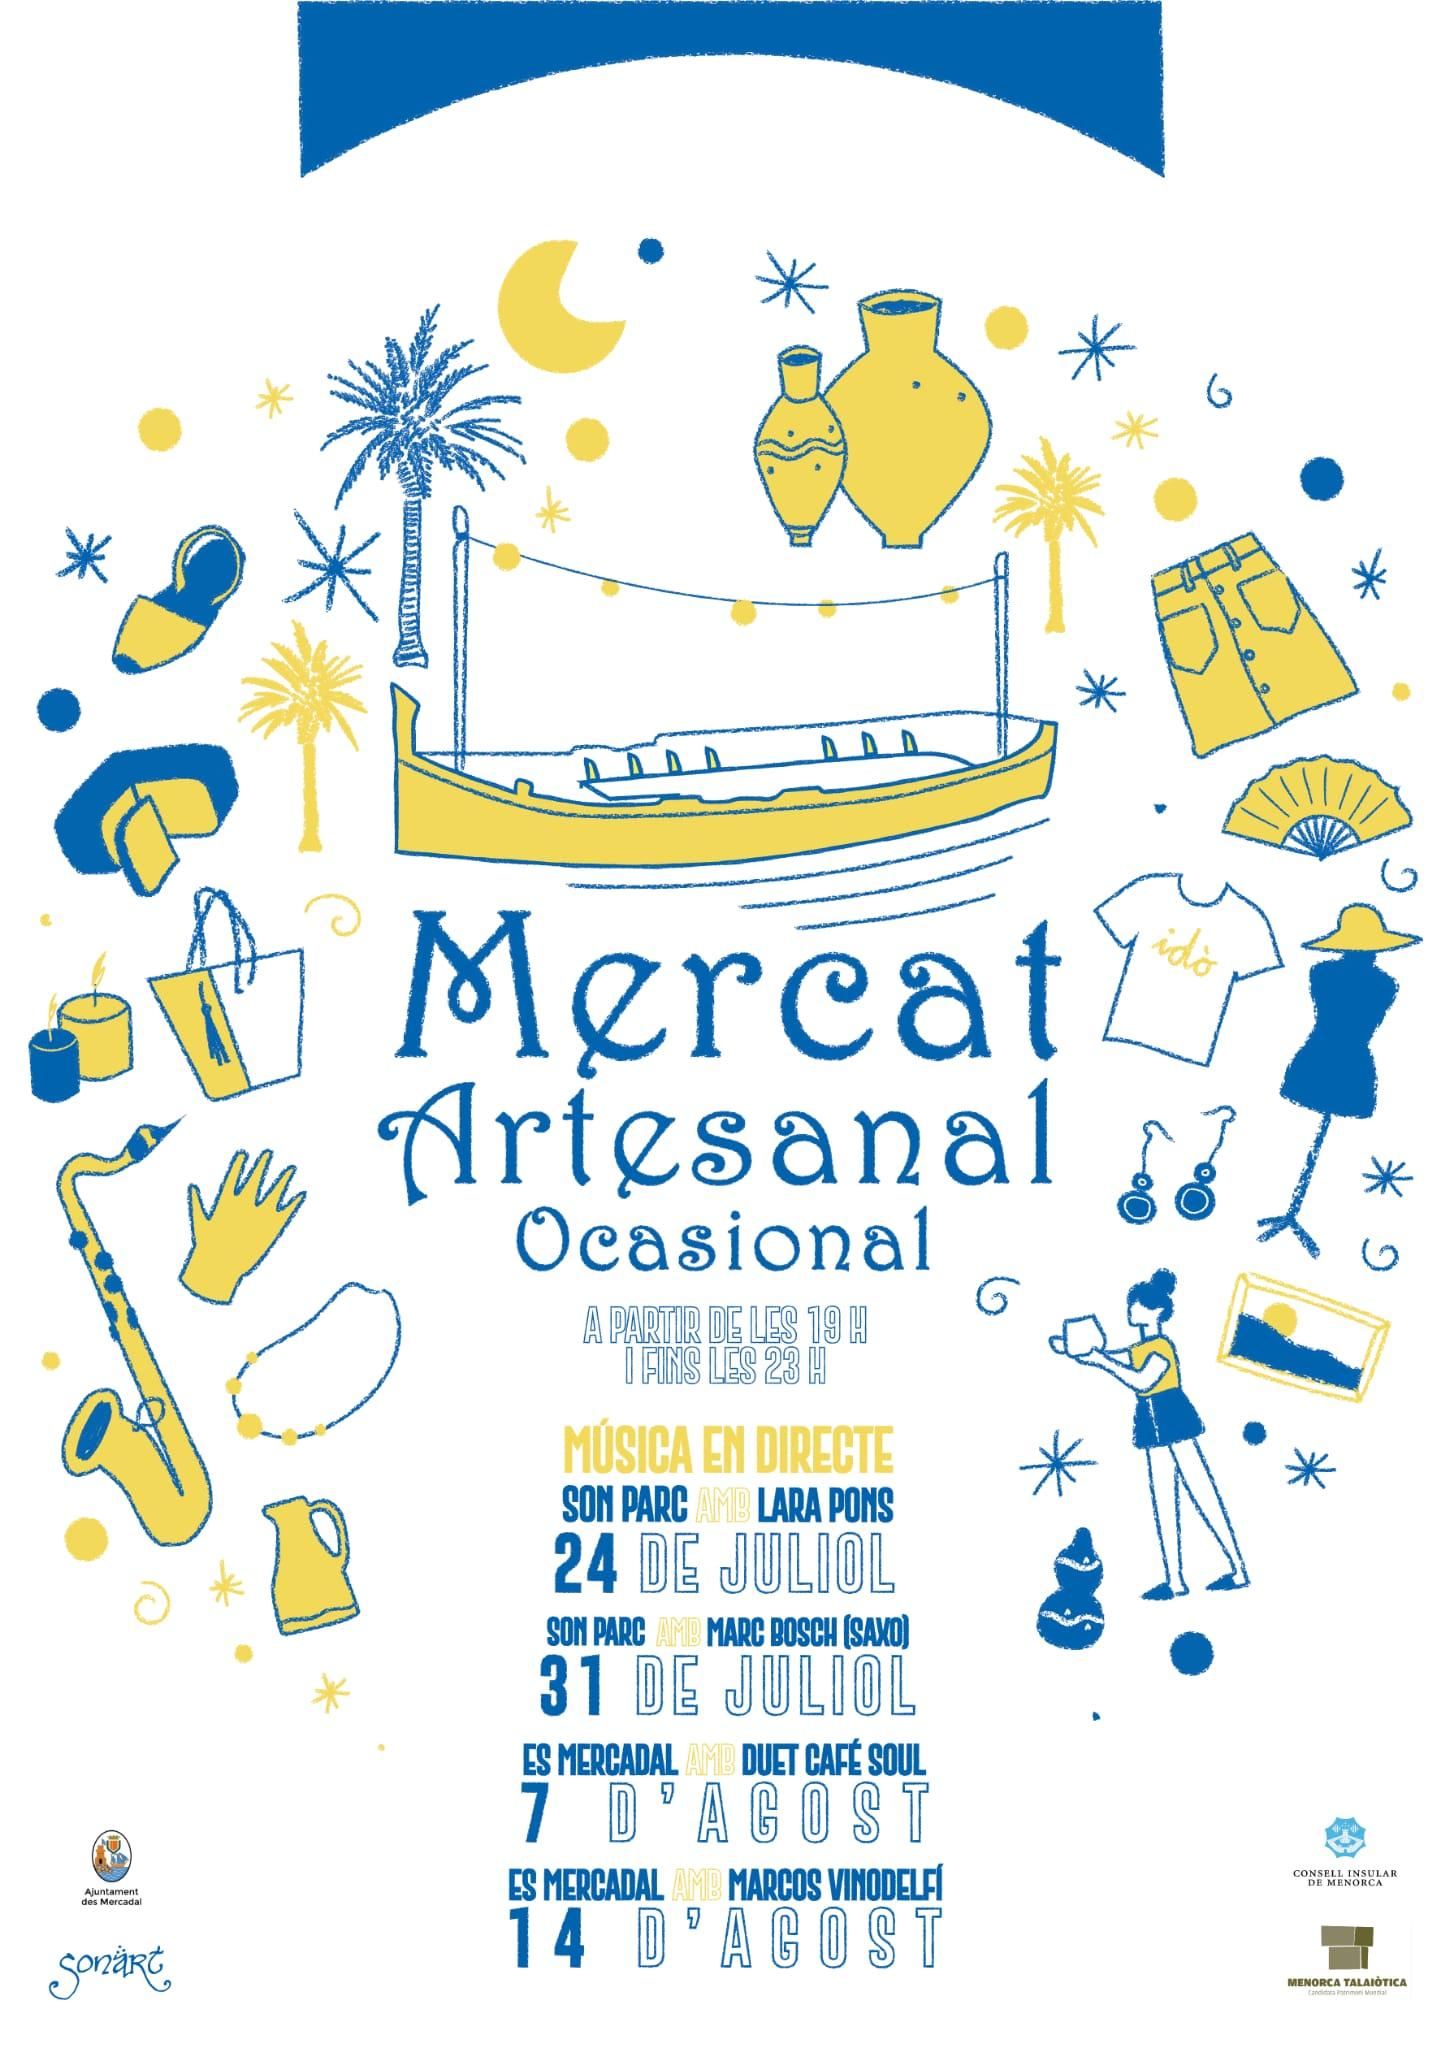 MERCAT ARTESANAL OCASIONAL - MÚSICA EN DIRECTE